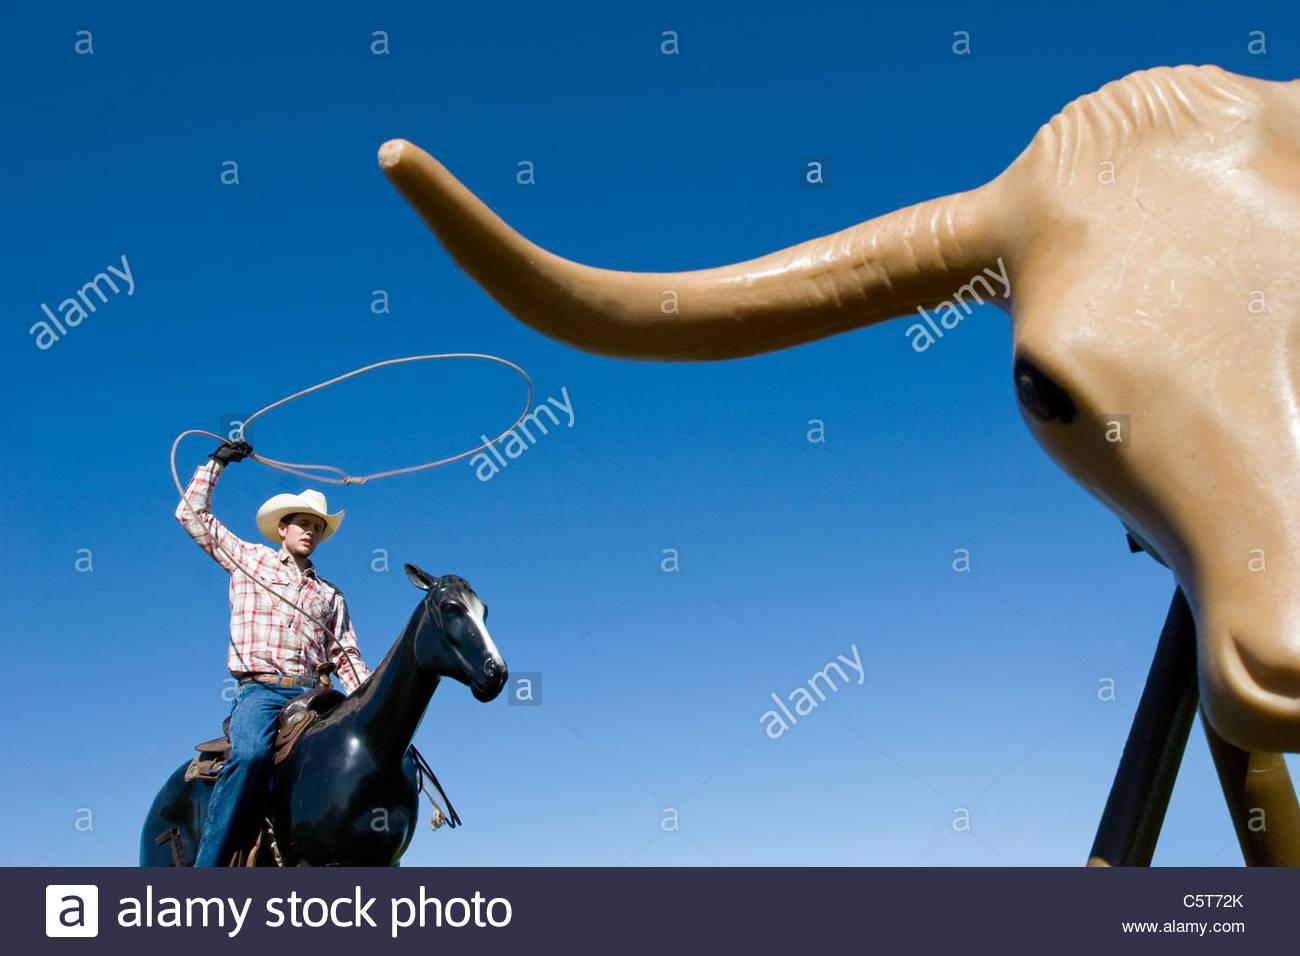 USA, Texas, Dallas, Cowboy using lasso - Stock Image